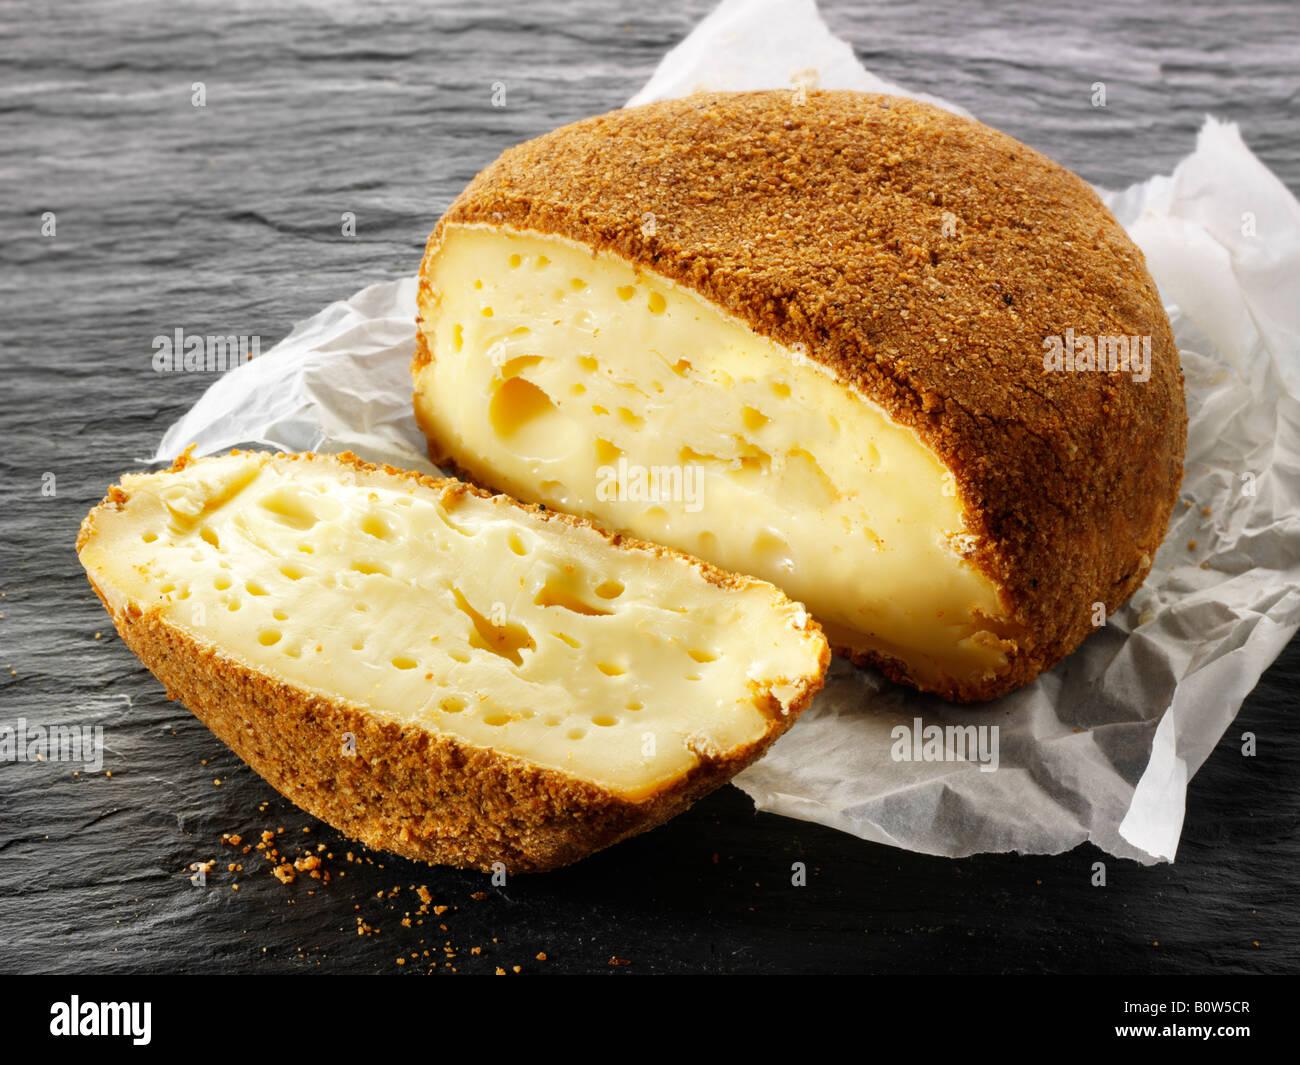 La Pucelle regional francesa de Normandía, queso de leche de vaca con licor de manzana de Fromagerie Maitre Pennec Foto de stock